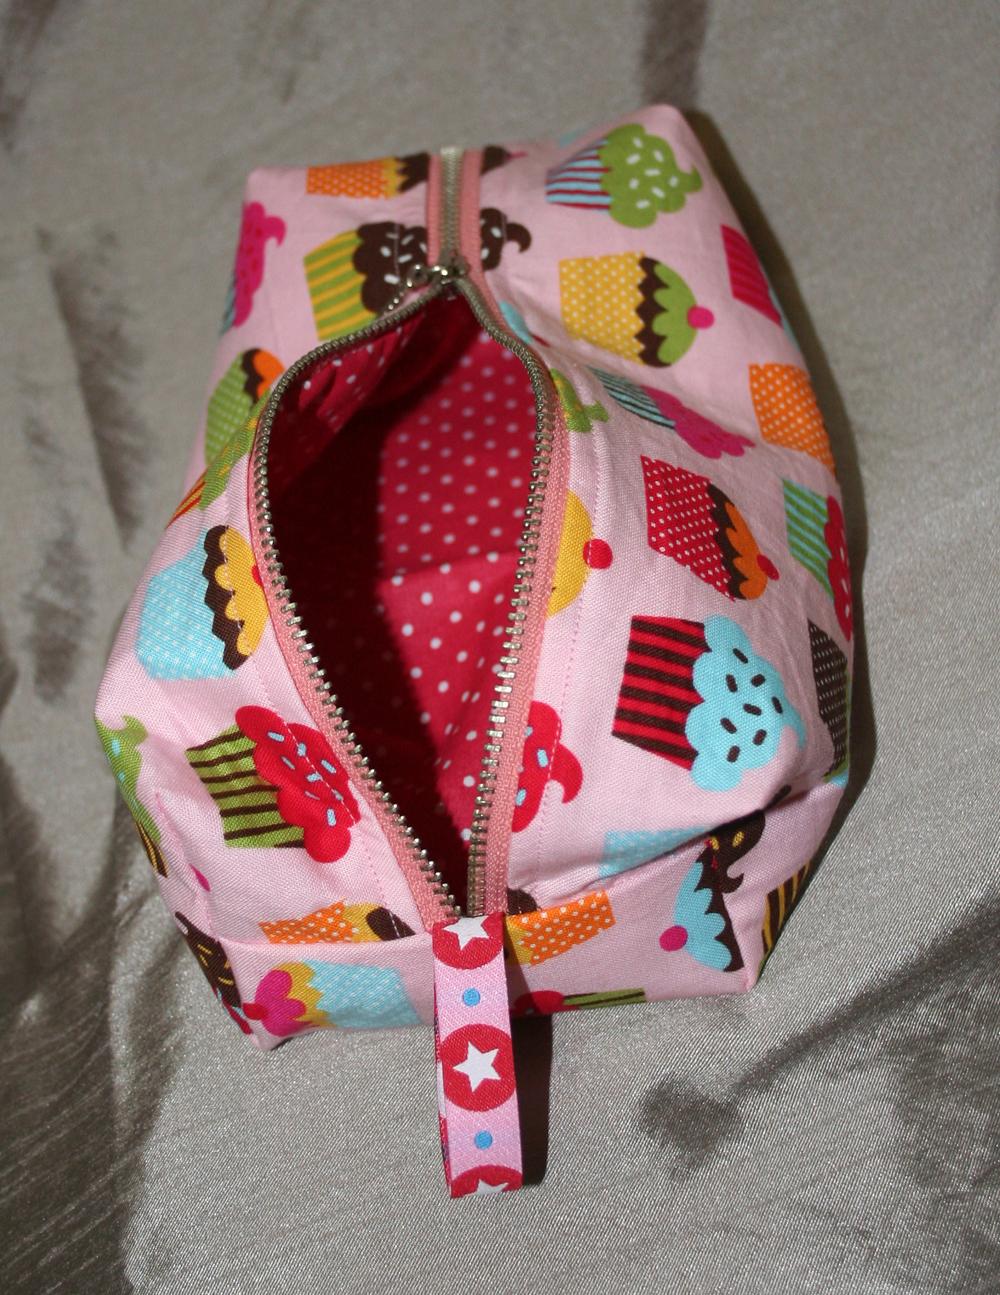 http://www.imaygine.com/wp-content/uploads/2012/10/cupcakes2.jpg